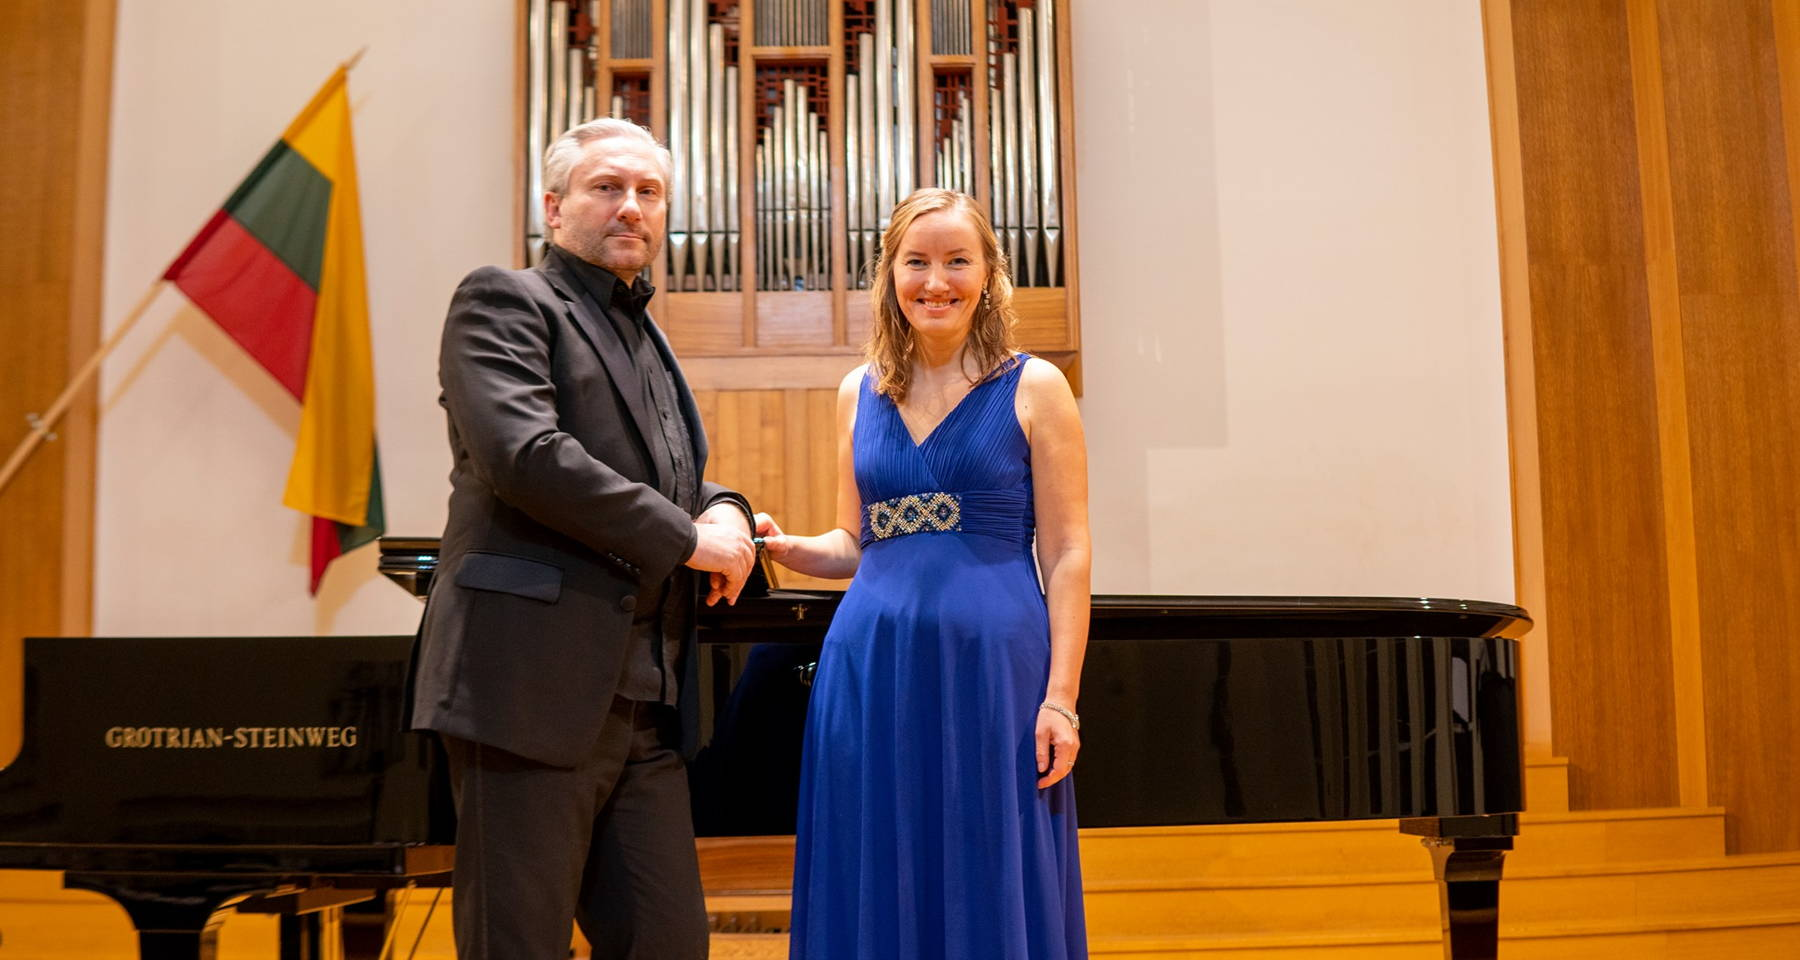 Edita Biliūtė (soprano), Linas Dužinskas (piano) Bethoven, Mozart, Mahler, Grieg songs